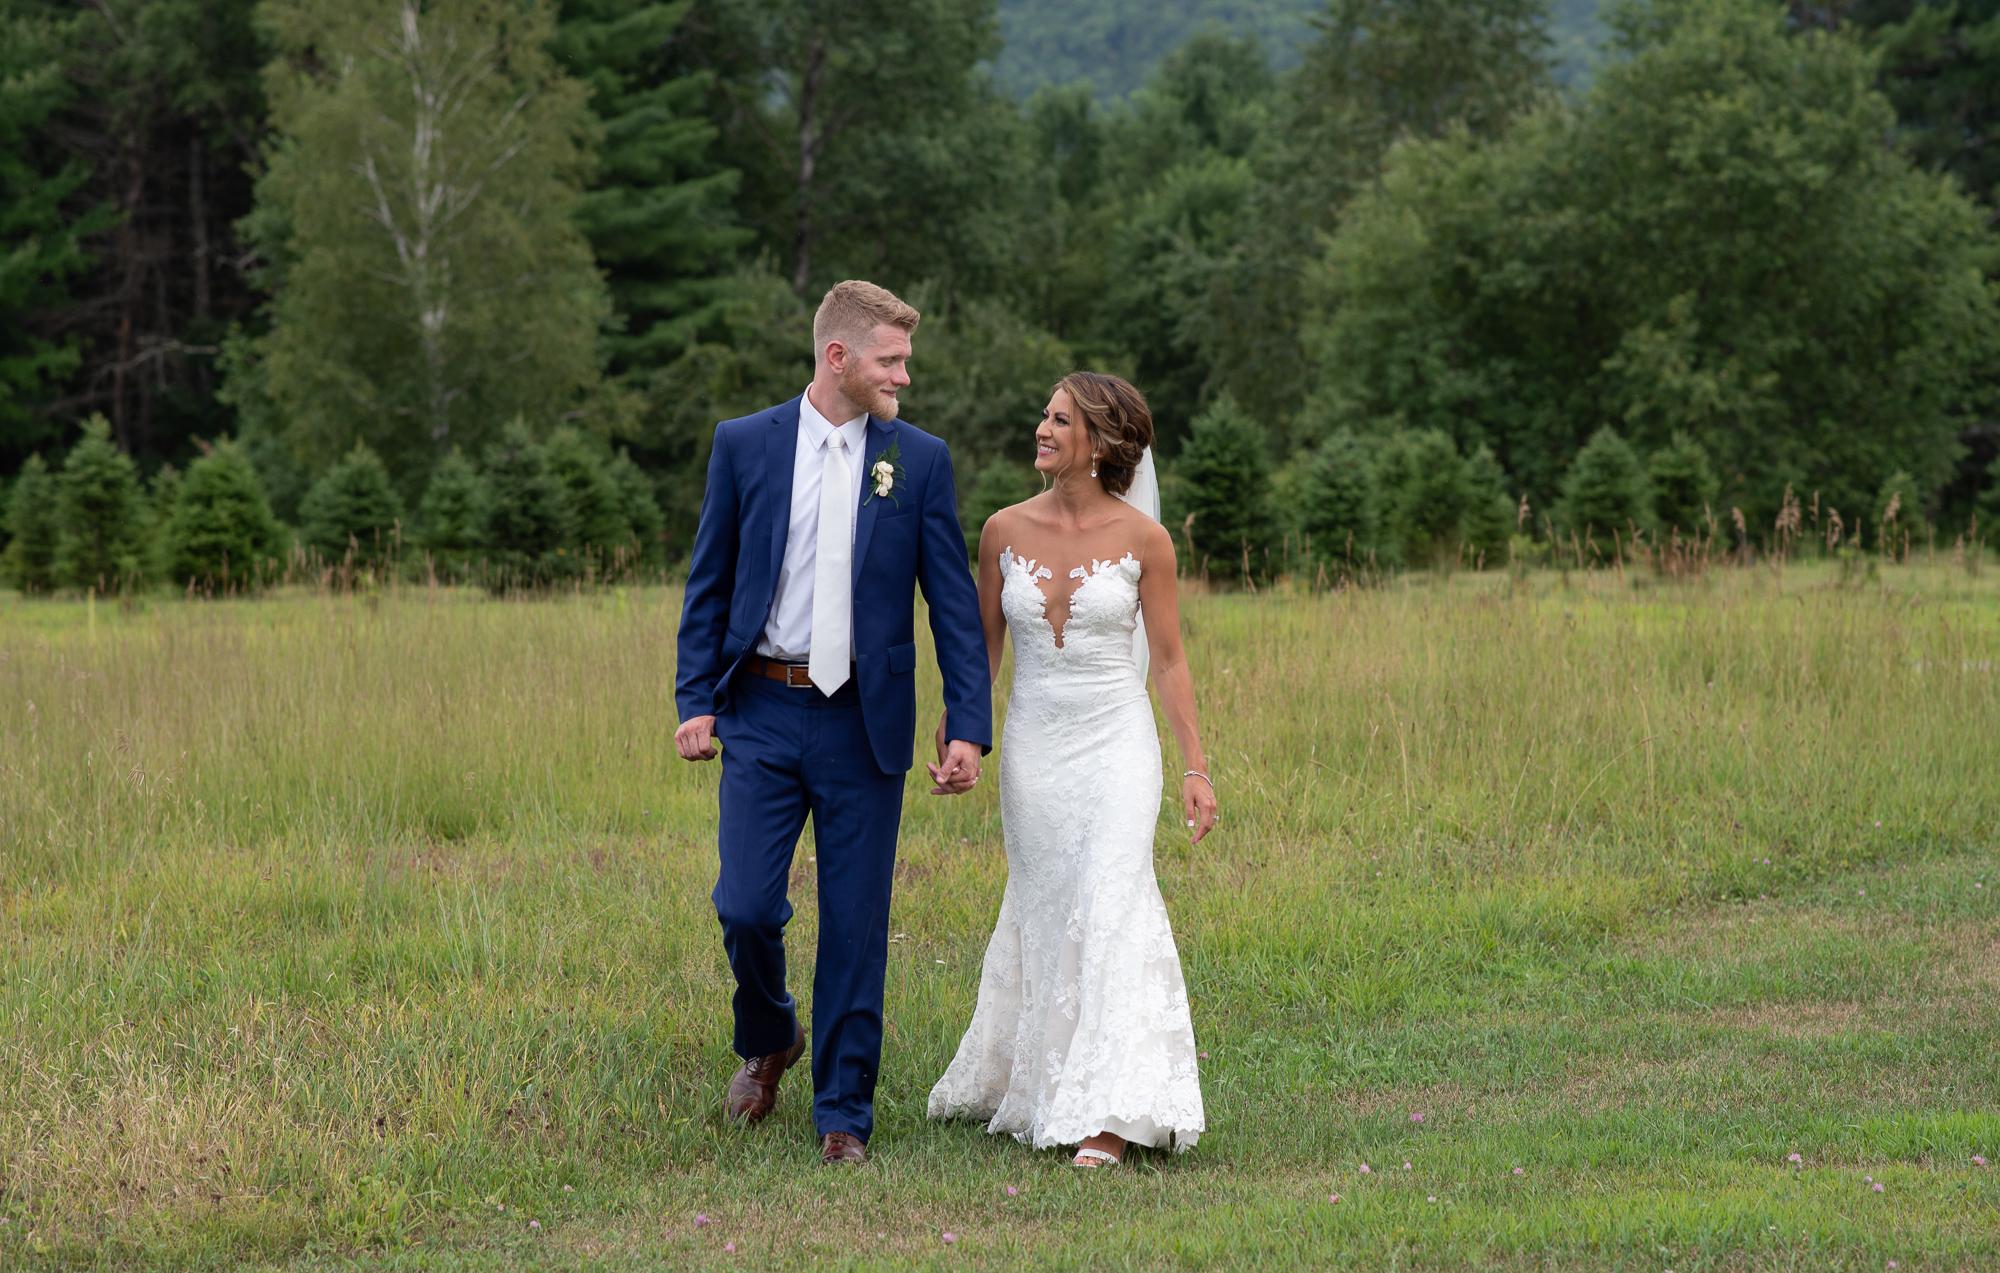 Glens Falls Living Weddings